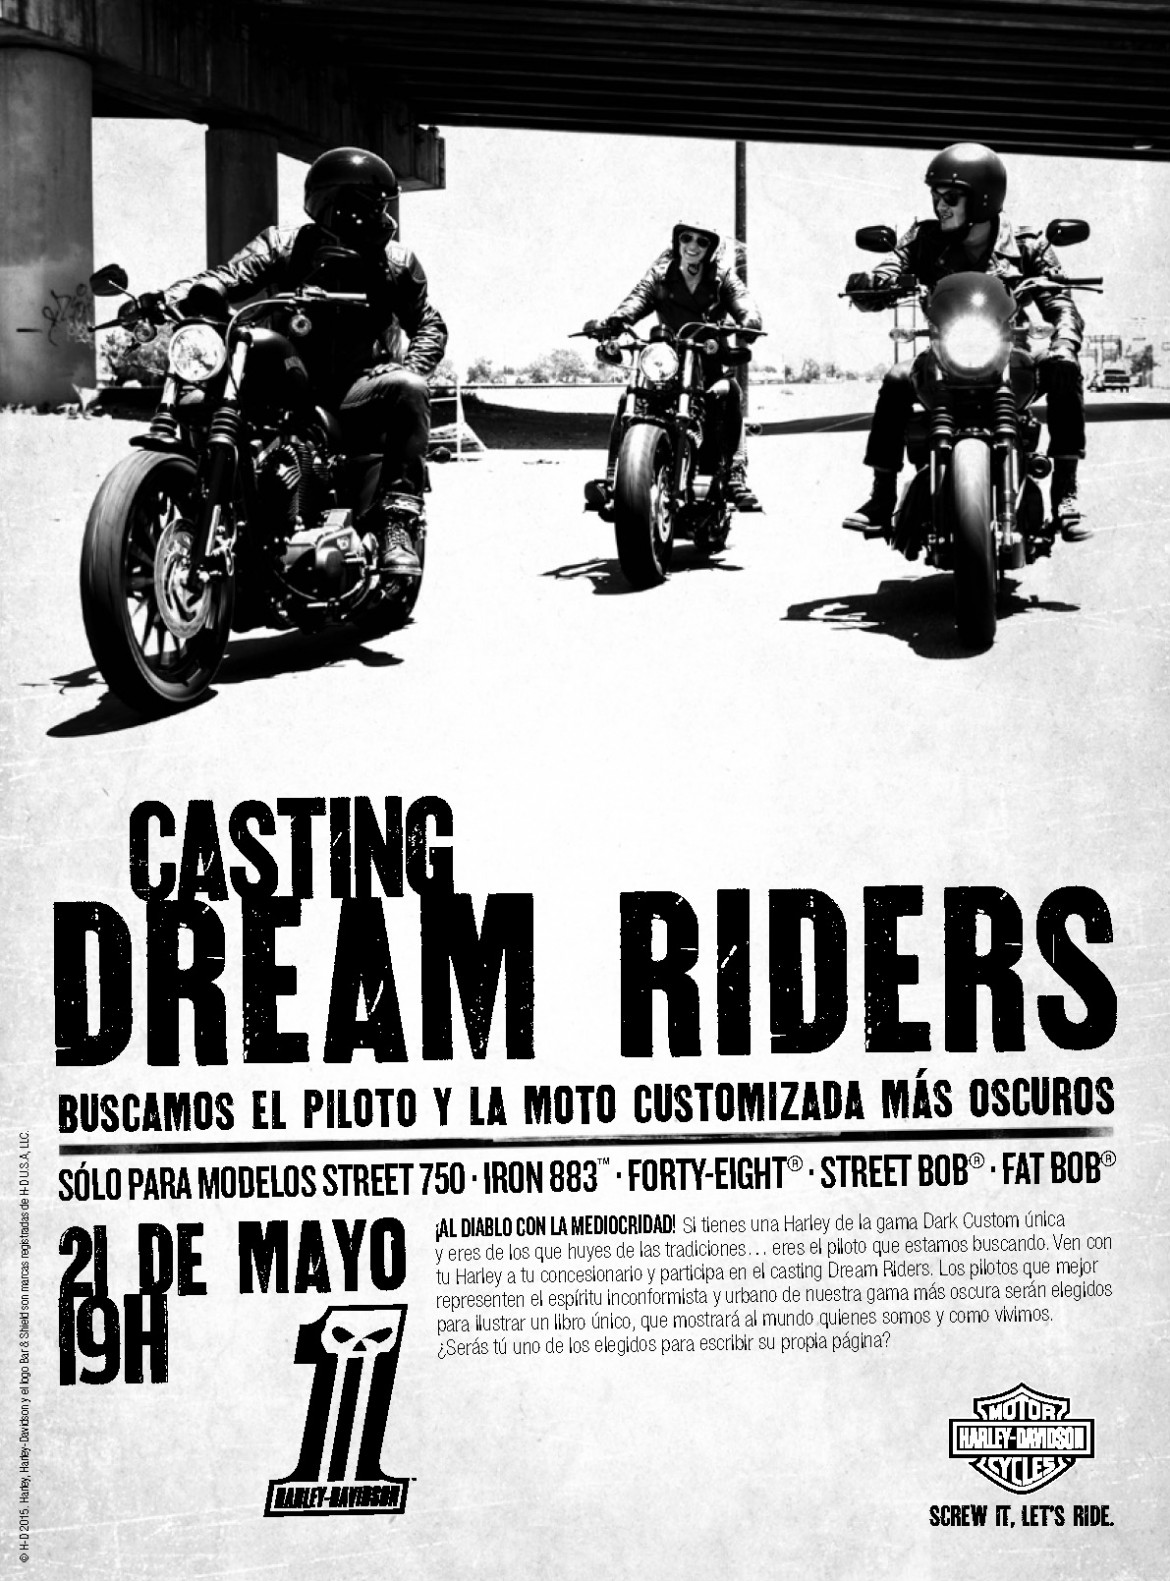 cartel dram casting